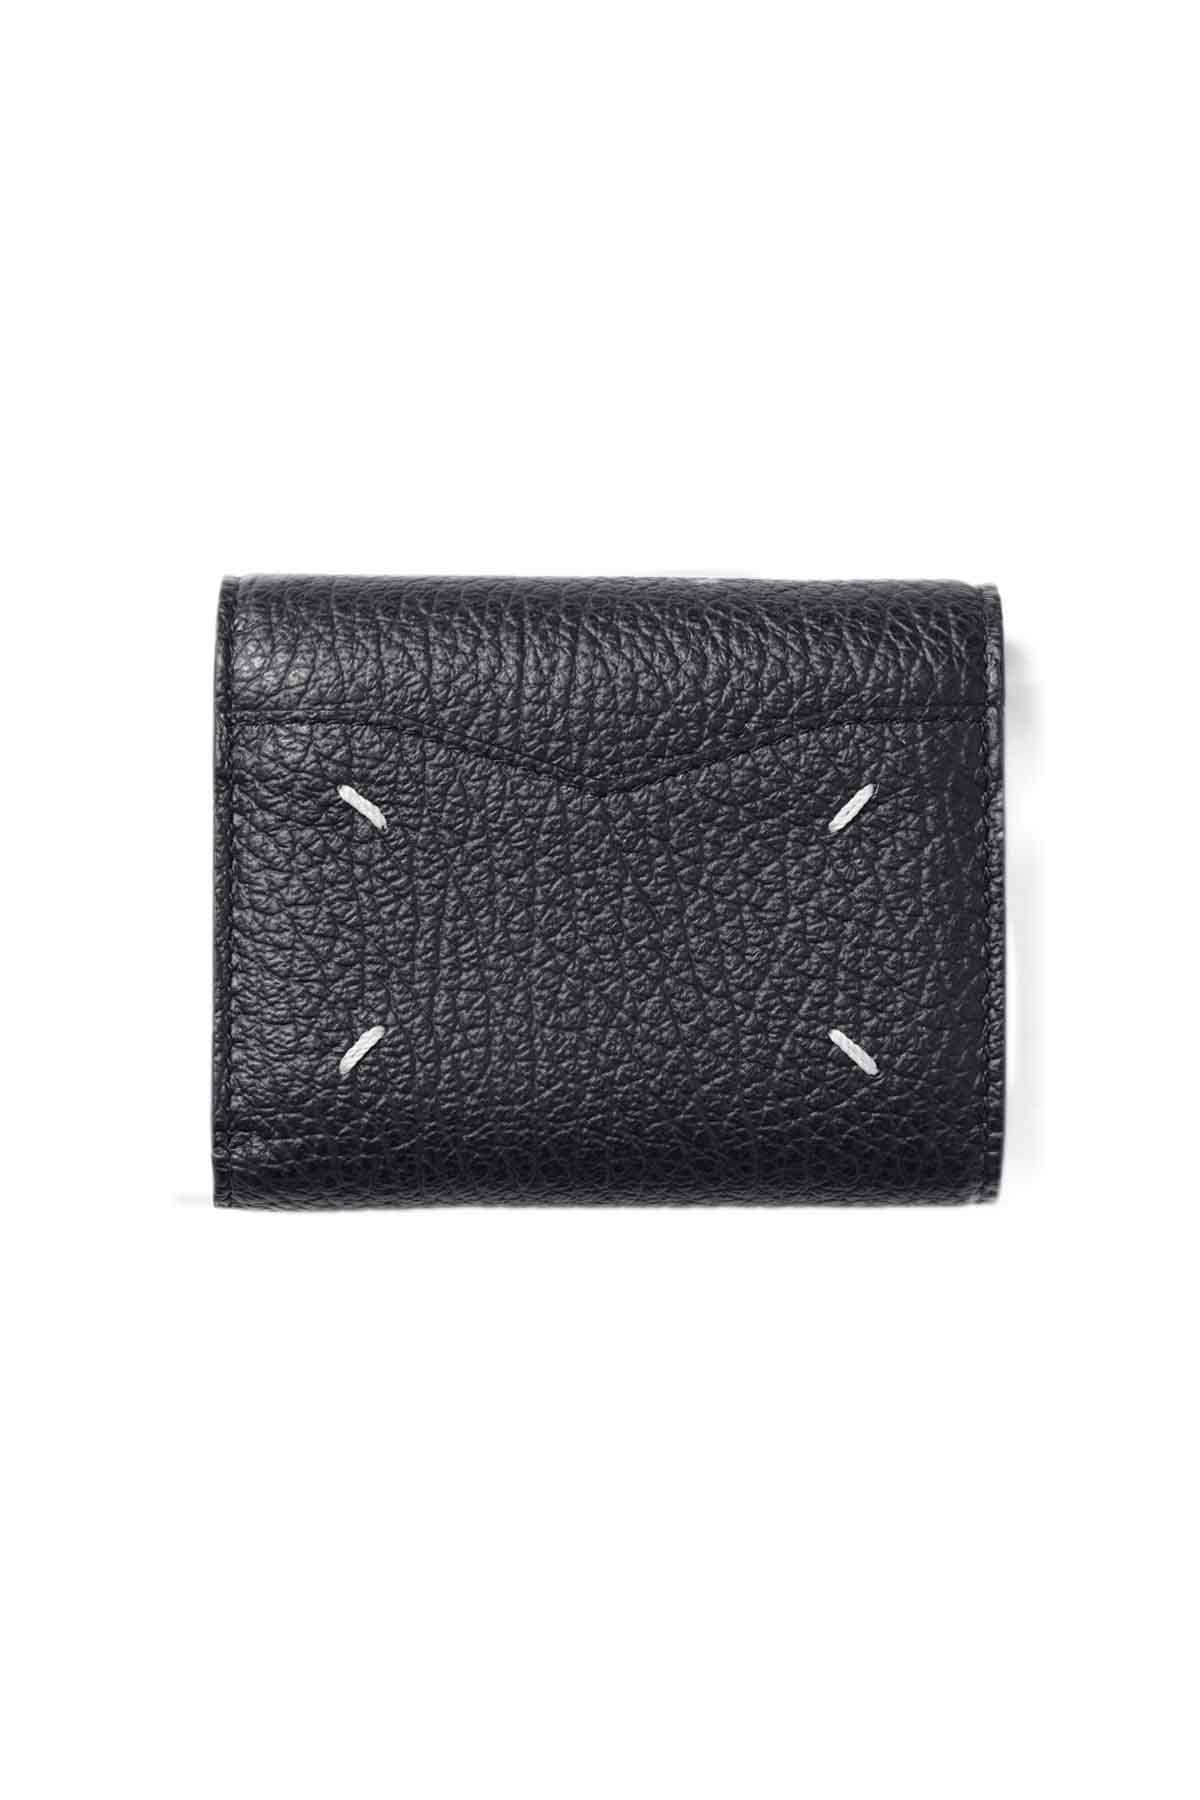 5AC Wallet Black[2021SS]